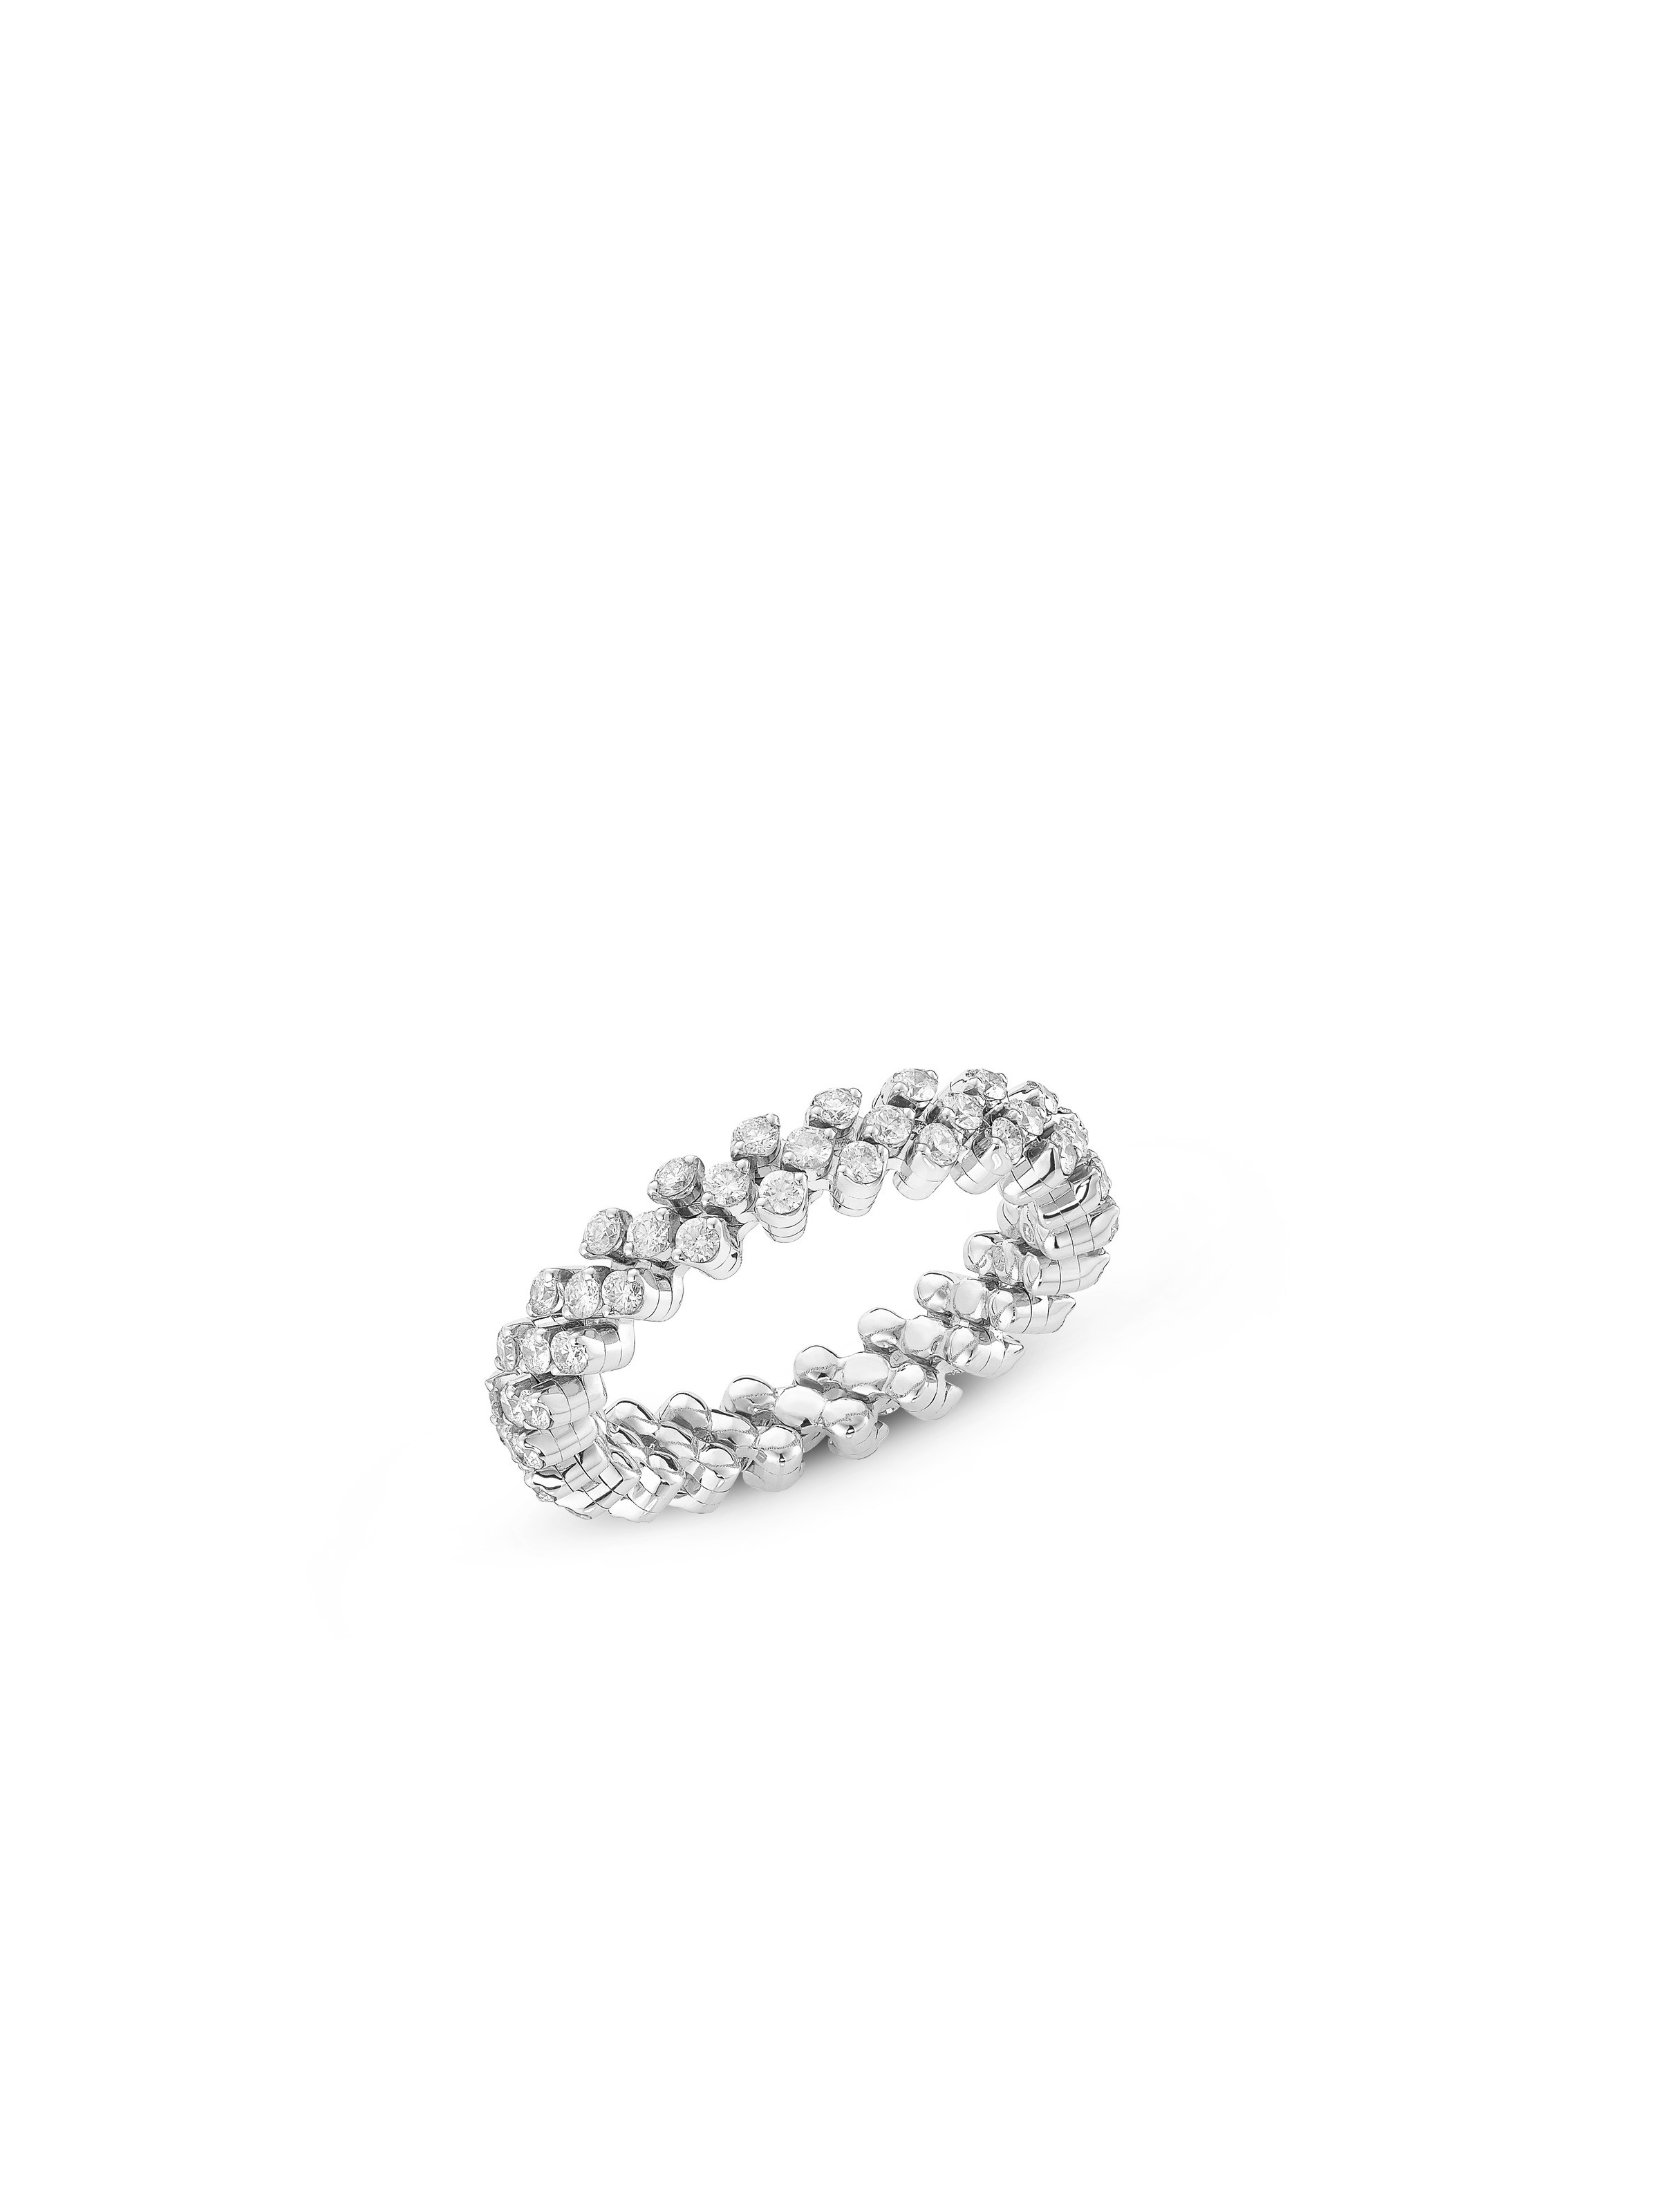 Ring Multisize Serafino Consoli